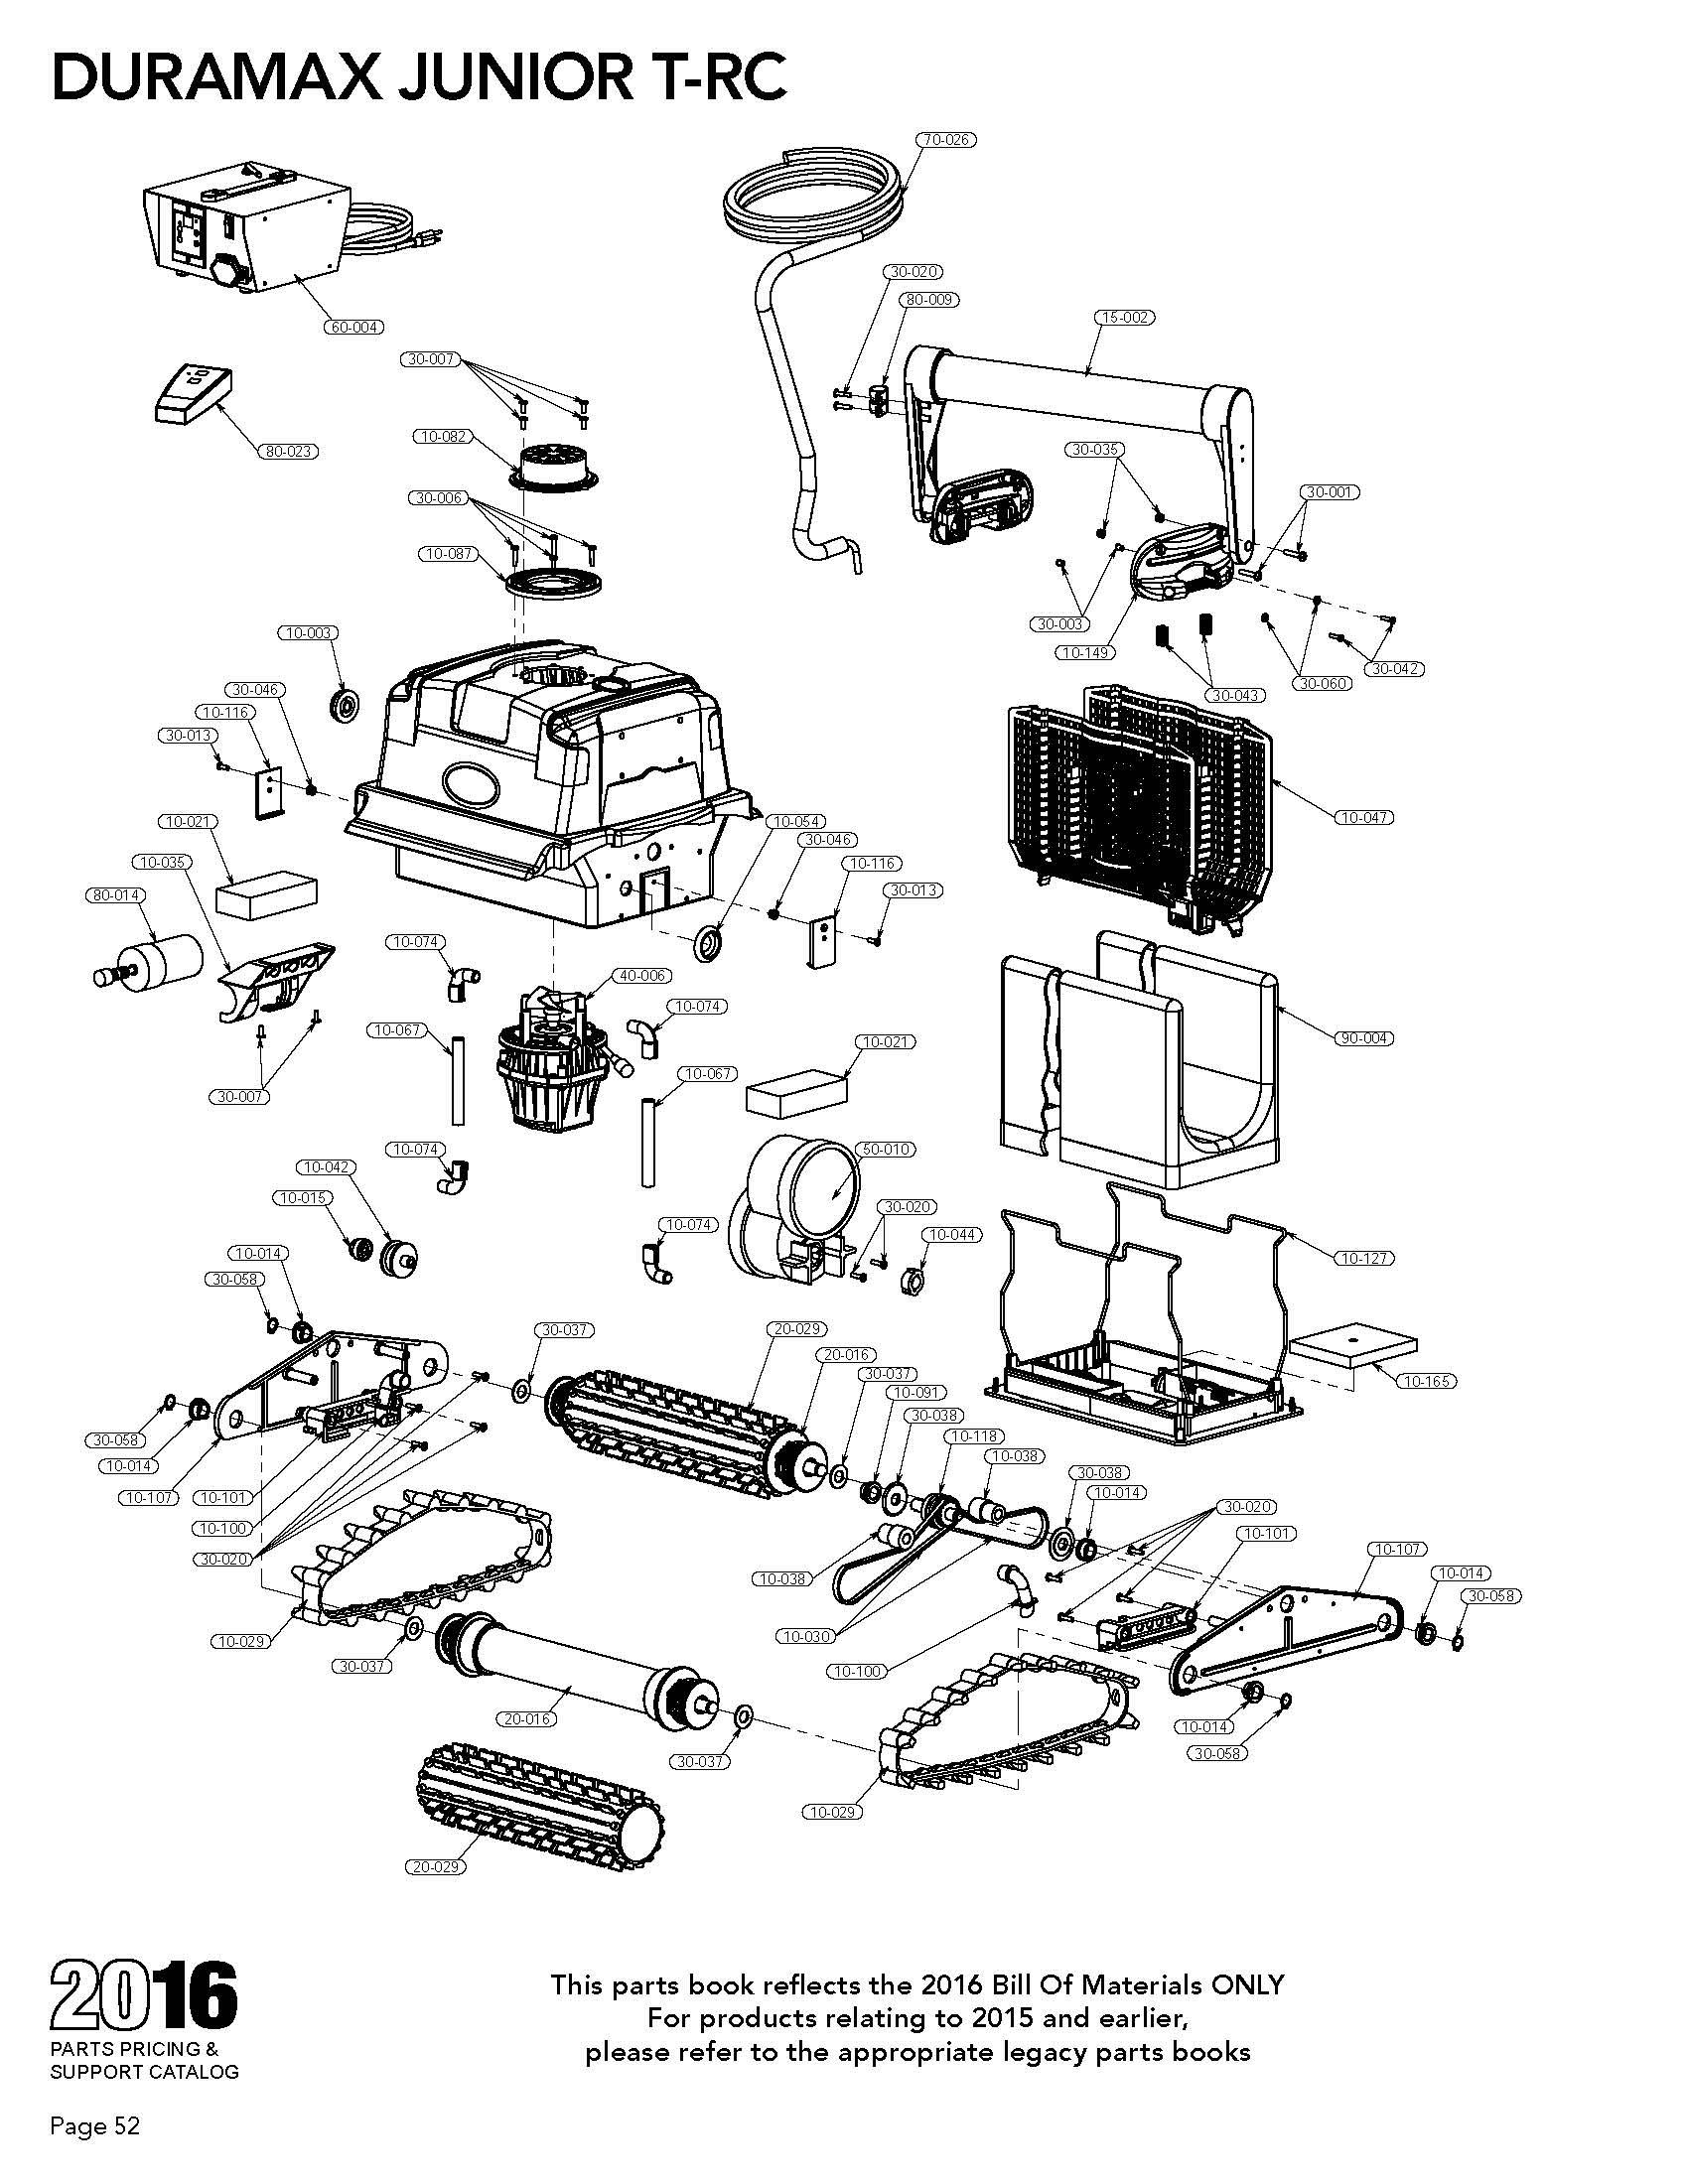 Duramax Jr T Rc Parts Diagram Amp Parts List